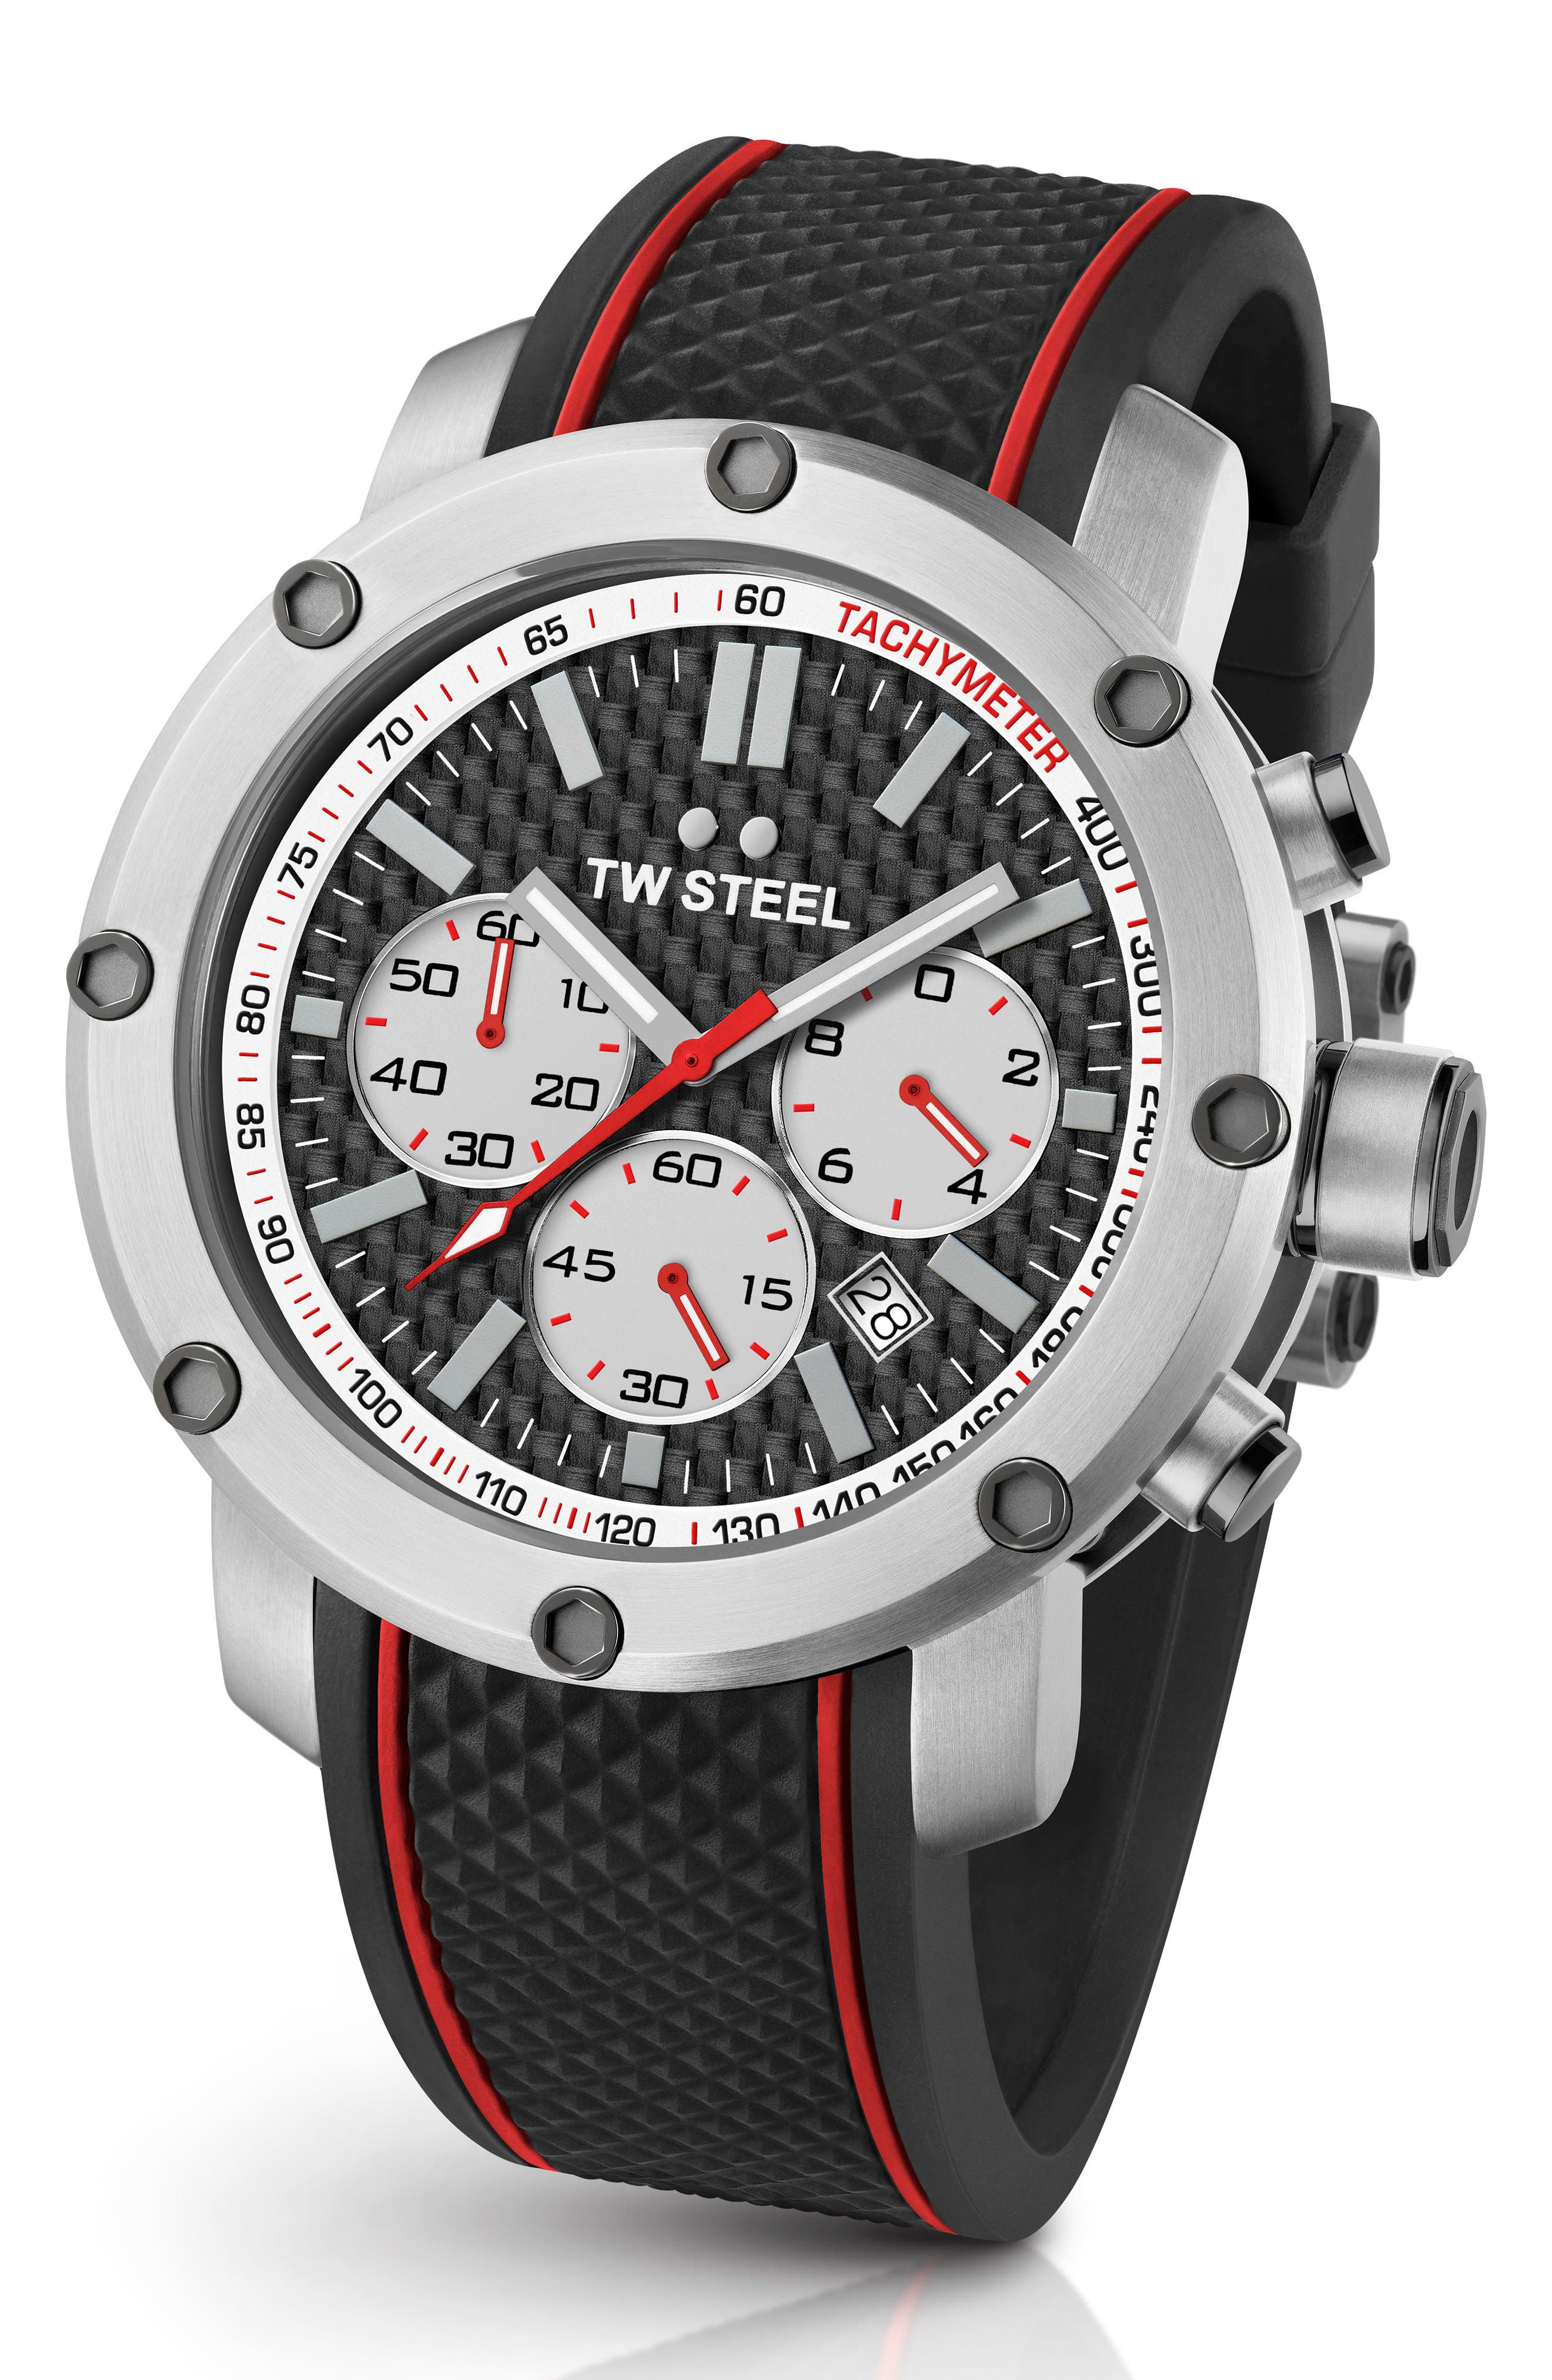 TW STEEL Grandeur Tech Silicone Strap Watch, 48Mm in Black/ Silver